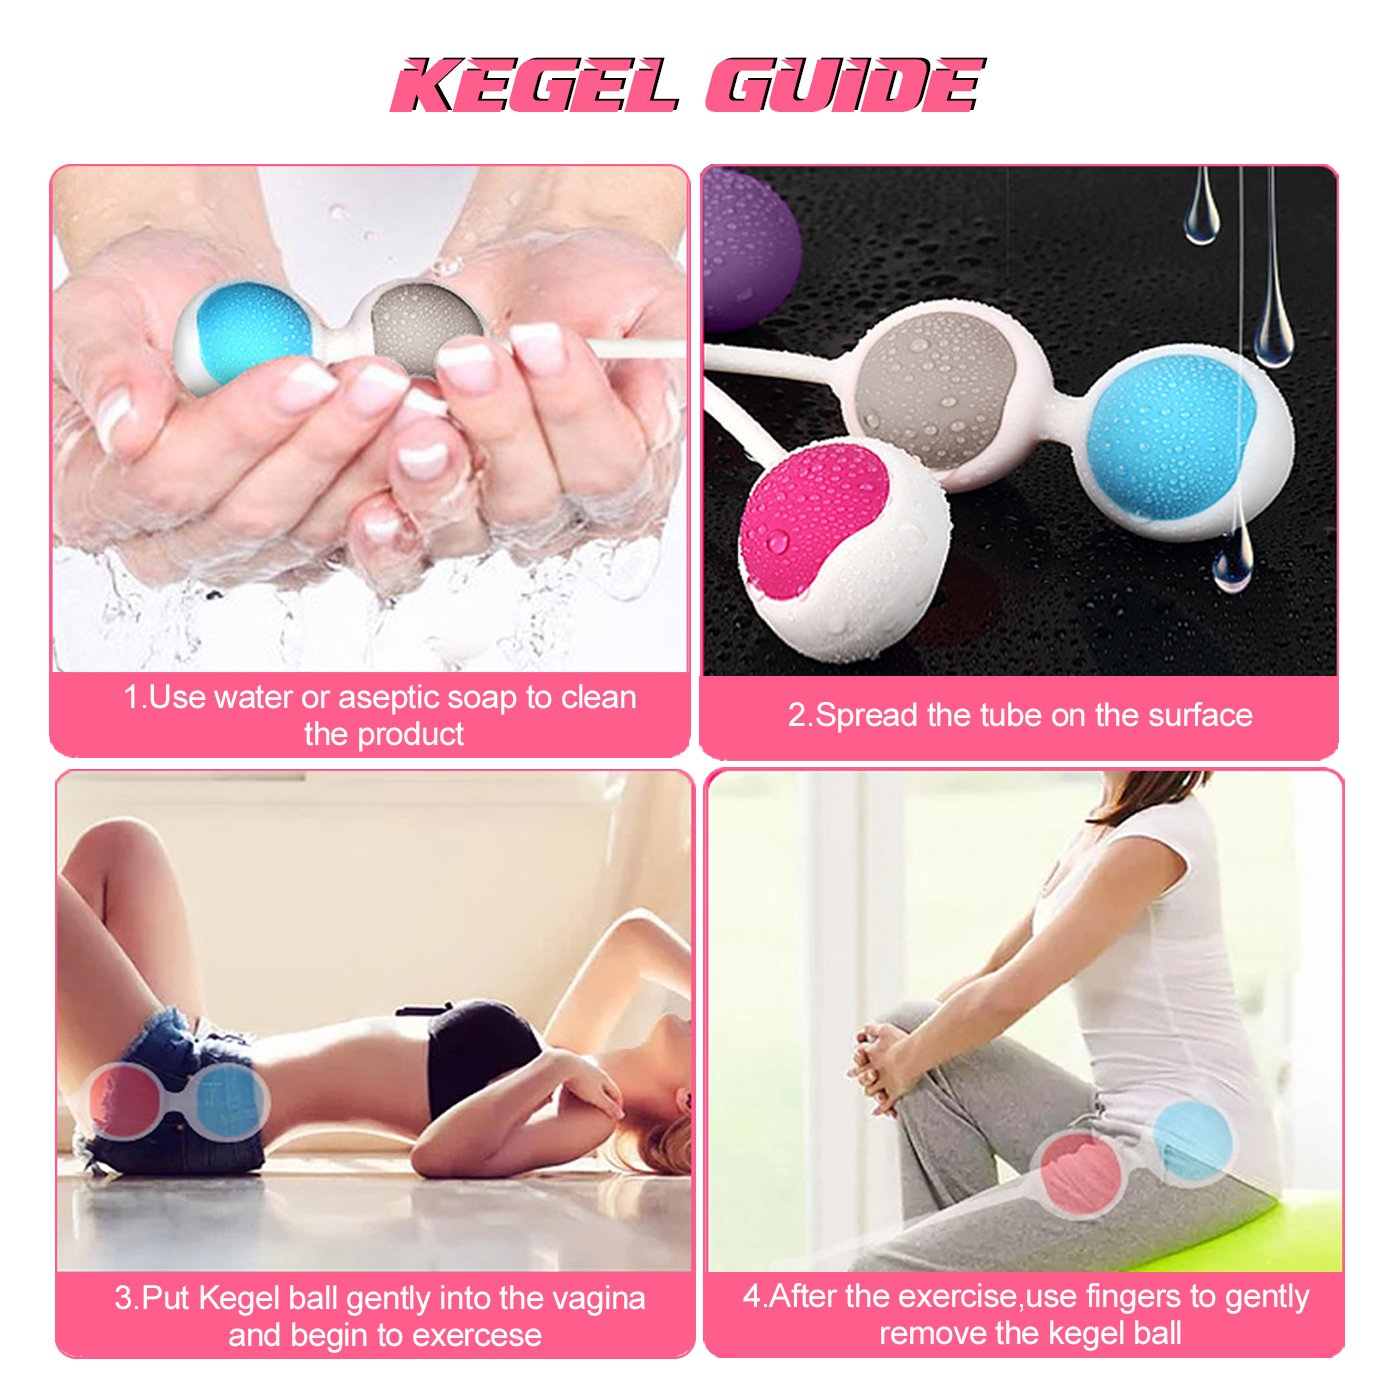 Amazon Com Kegel Exercise Weights Adorime Ben Wa Kegel Balls Weighted Exercise Kit For Beginner Doctor Recommended For Women Girls Bladder Control